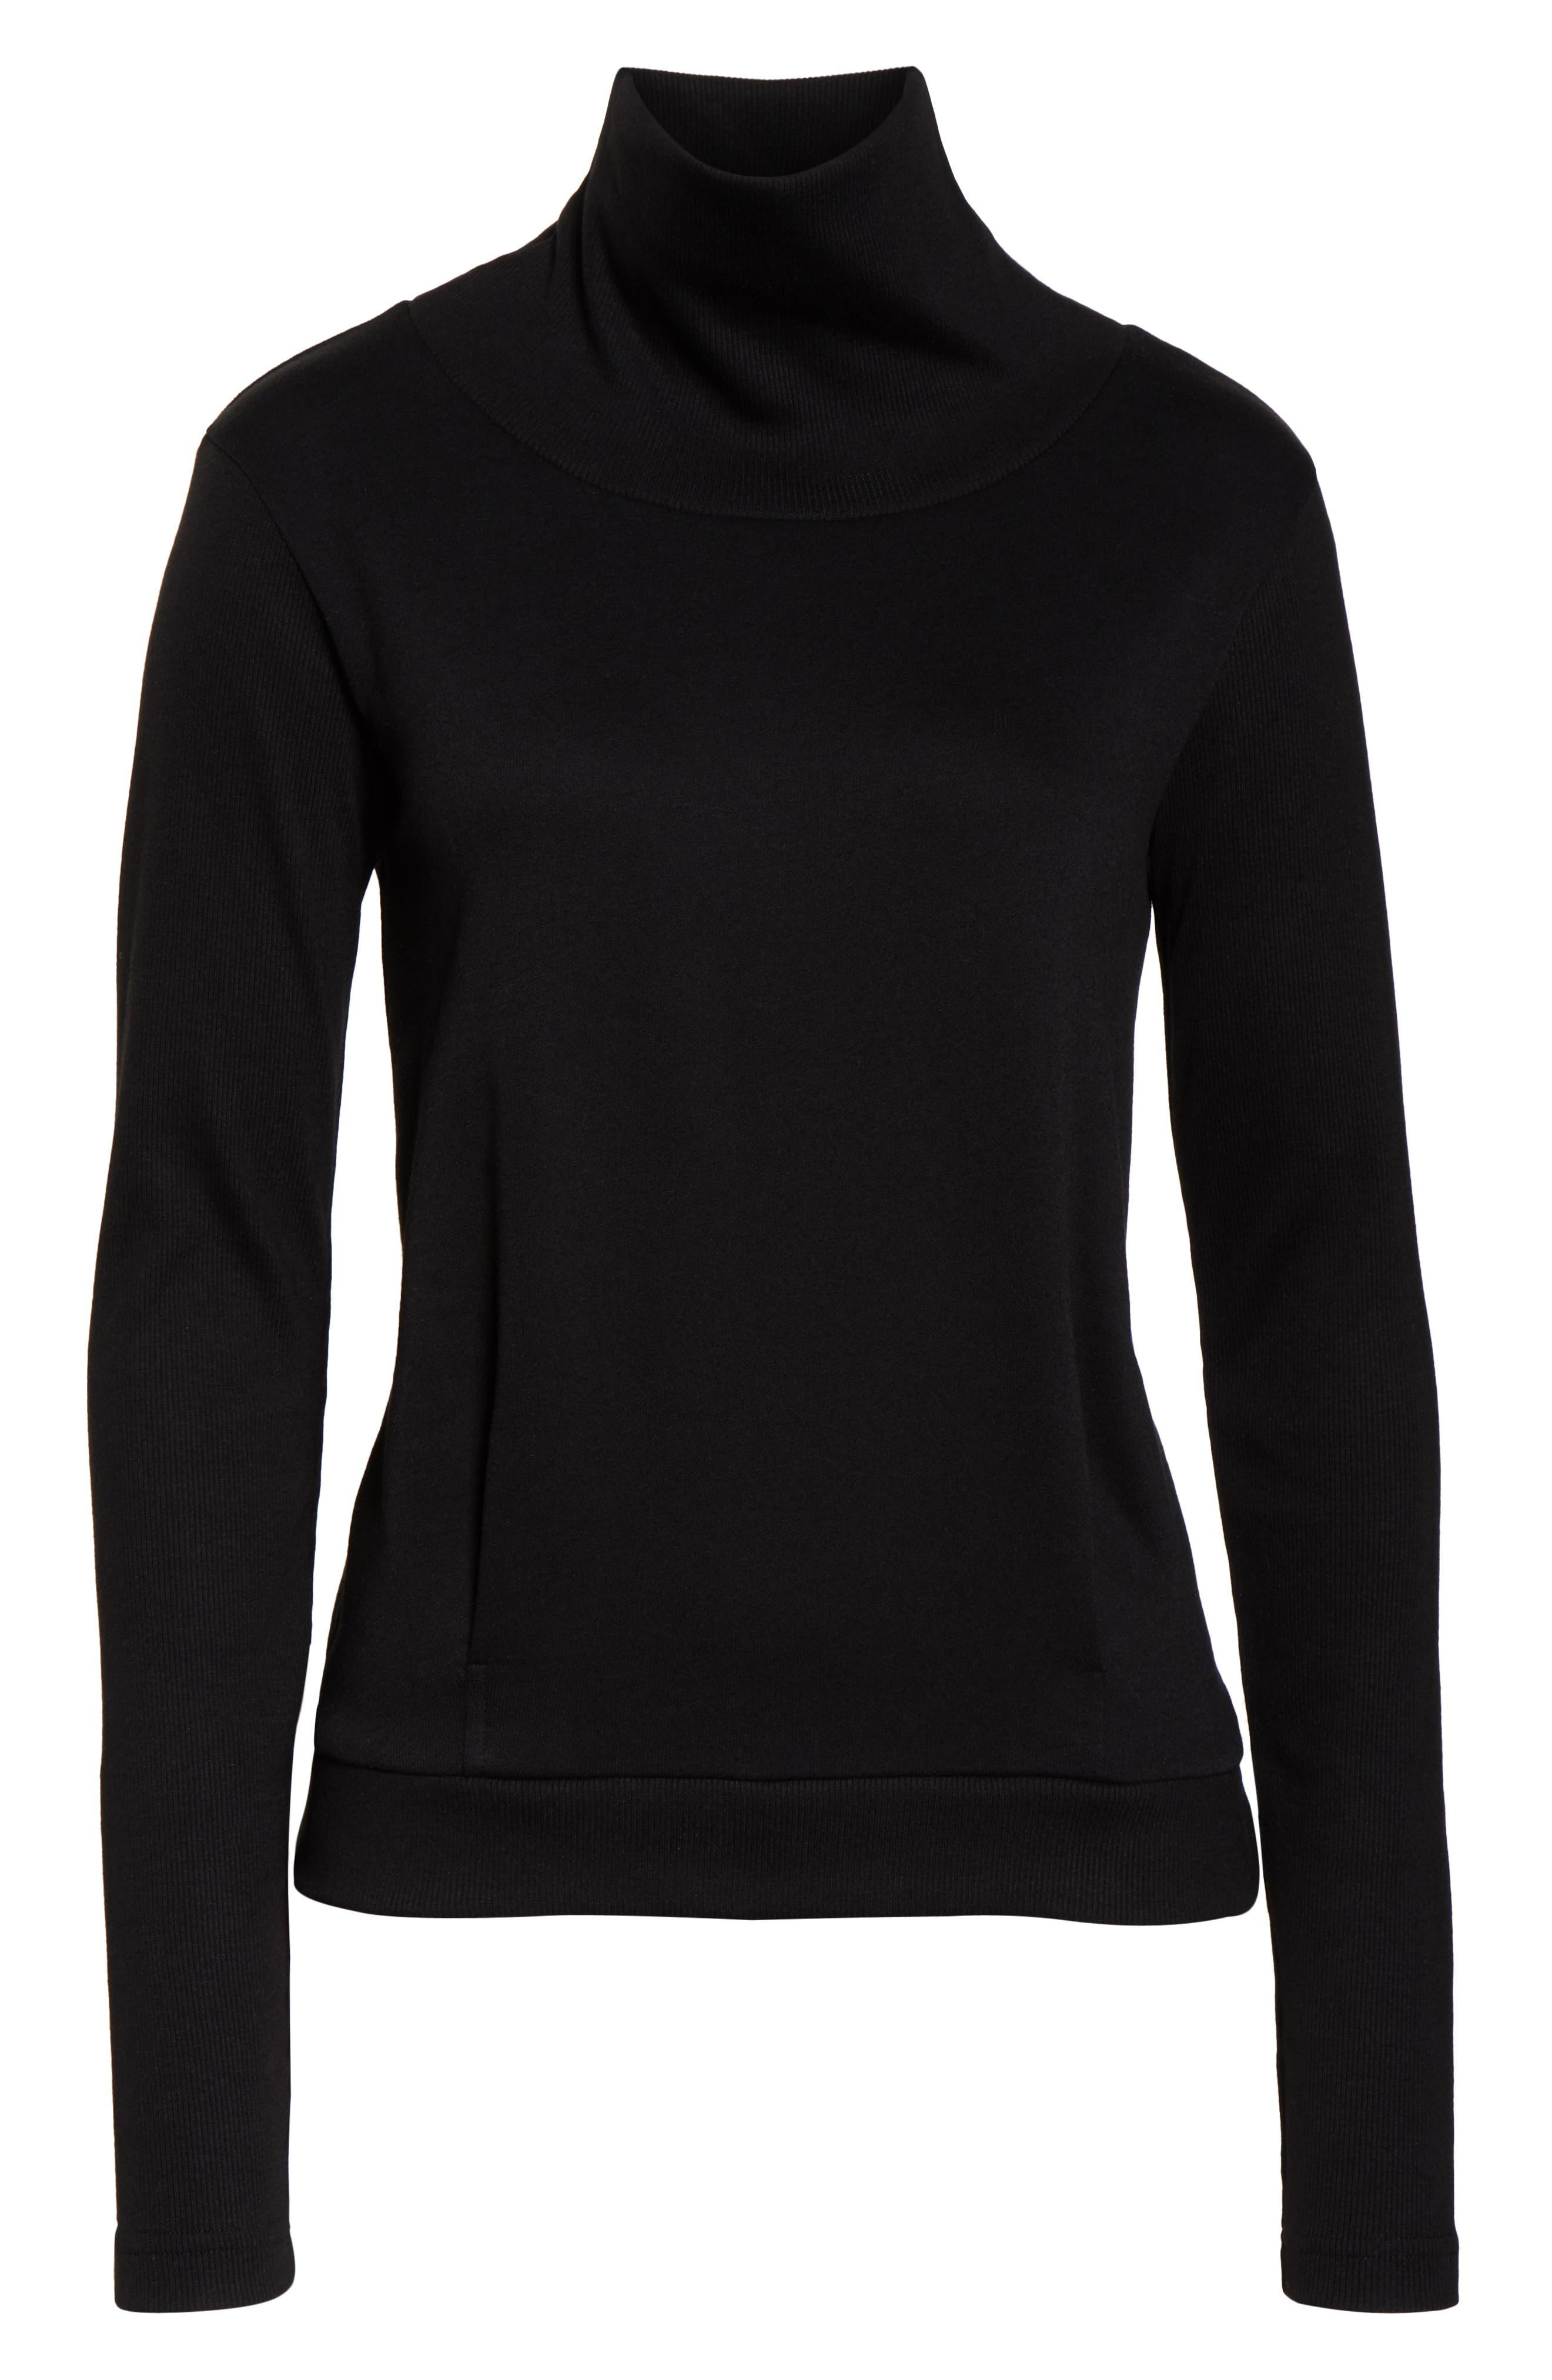 ALO, Clarity Long Sleeve Sweatshirt, Alternate thumbnail 7, color, BLACK